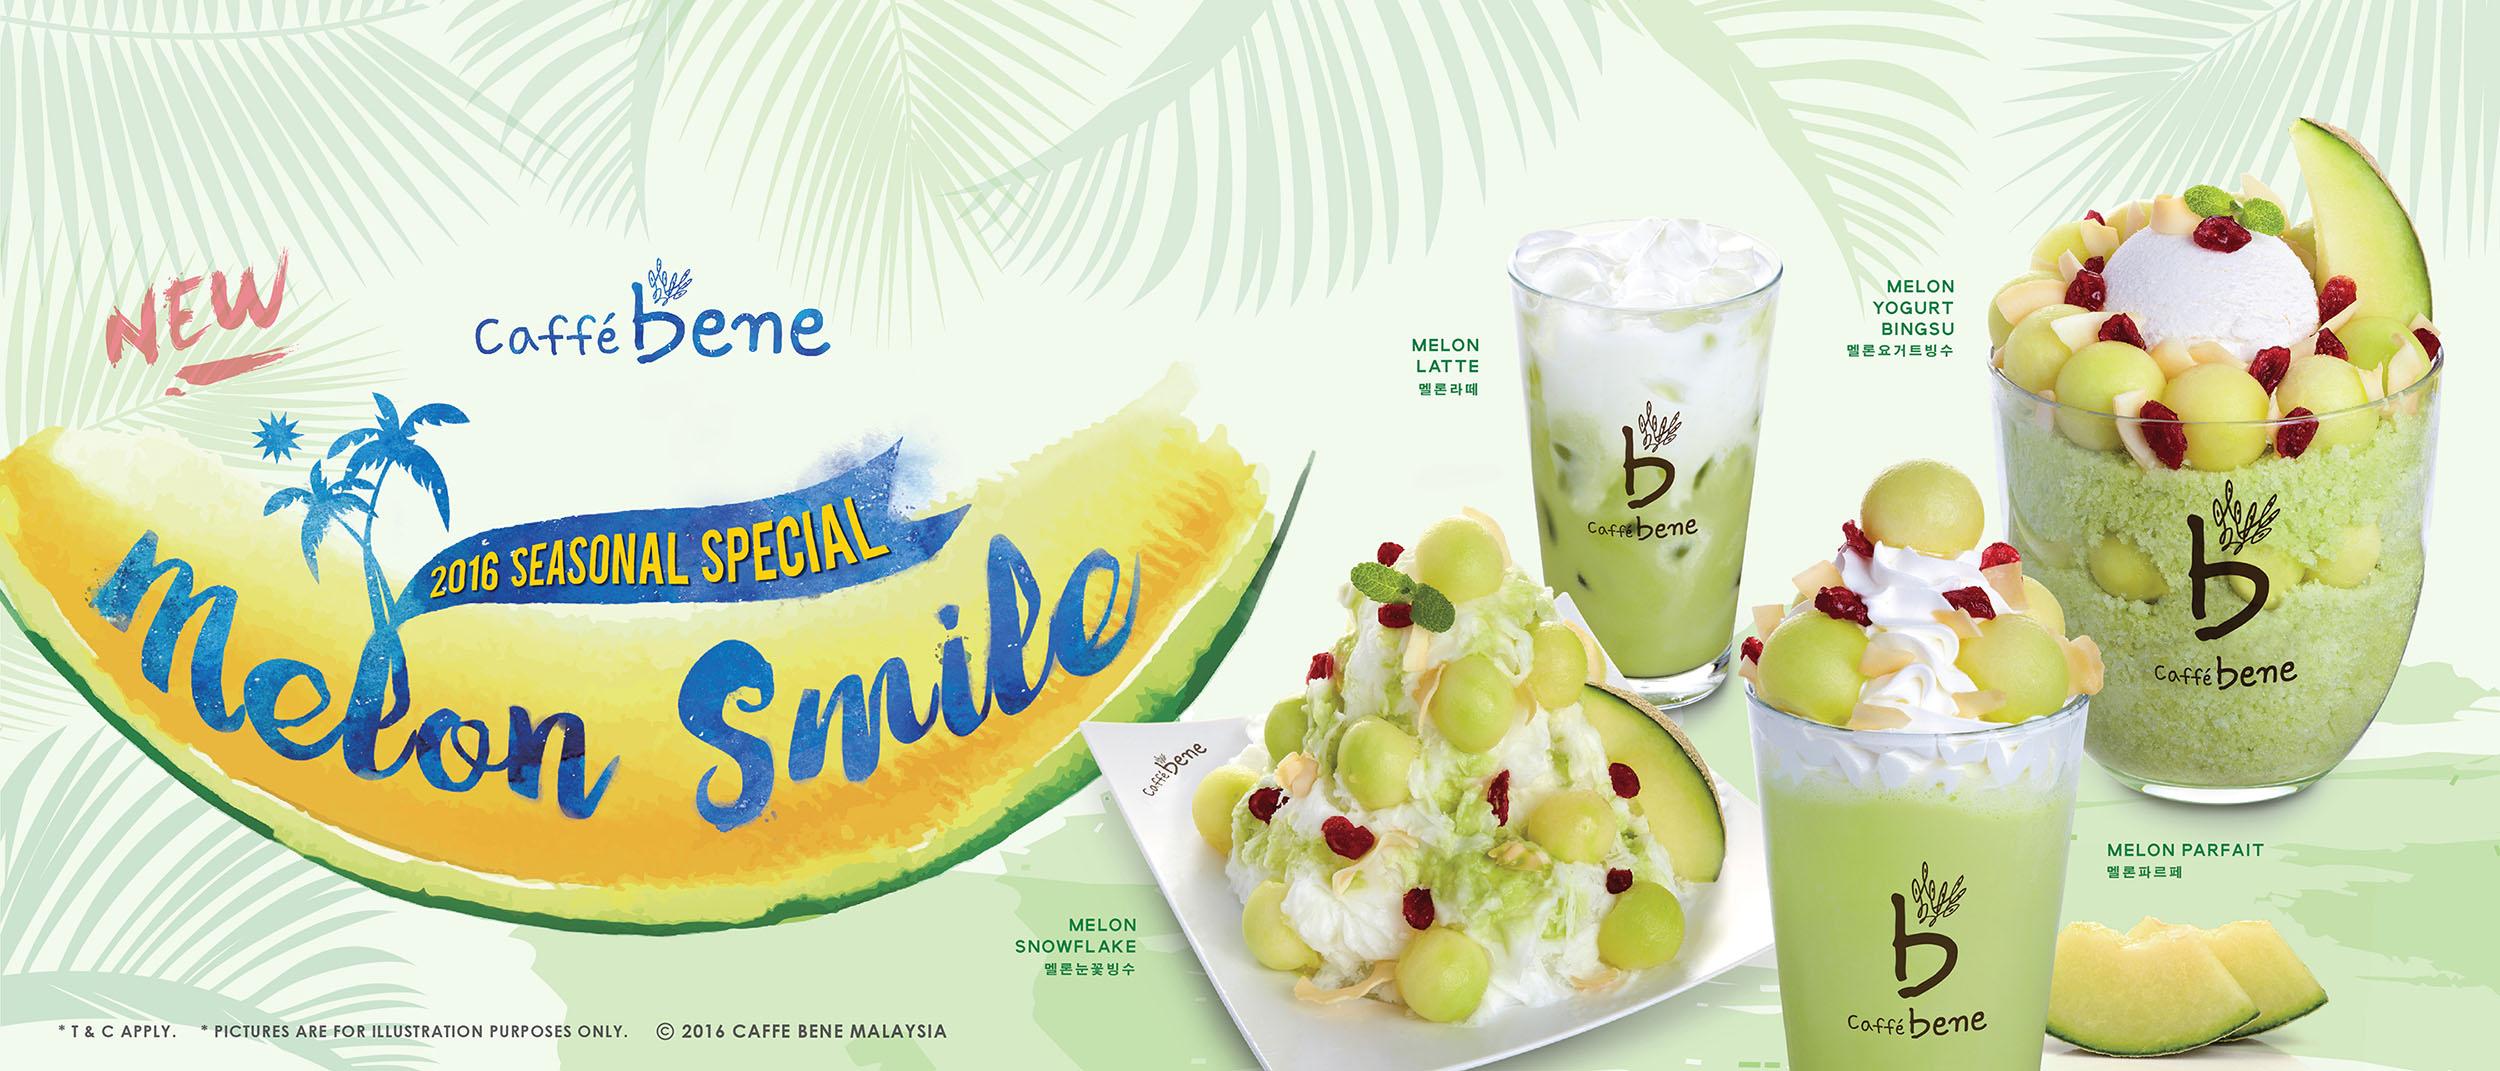 Caffè Bene Malaysia 2016 Seasonal Special Menu Melon Smile